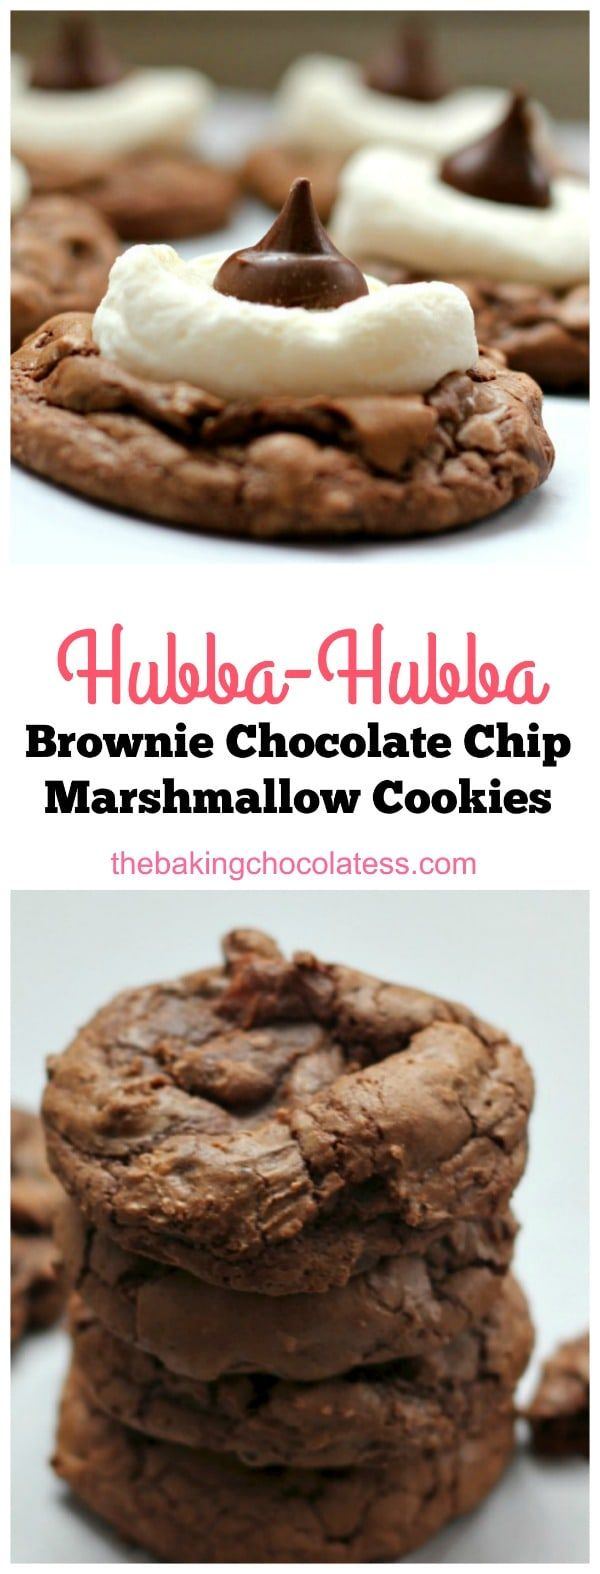 Hubba-Hubba' Brownie Chocolate Chip Marshmallow Cookies via @https://www.pinterest.com/BaknChocolaTess/